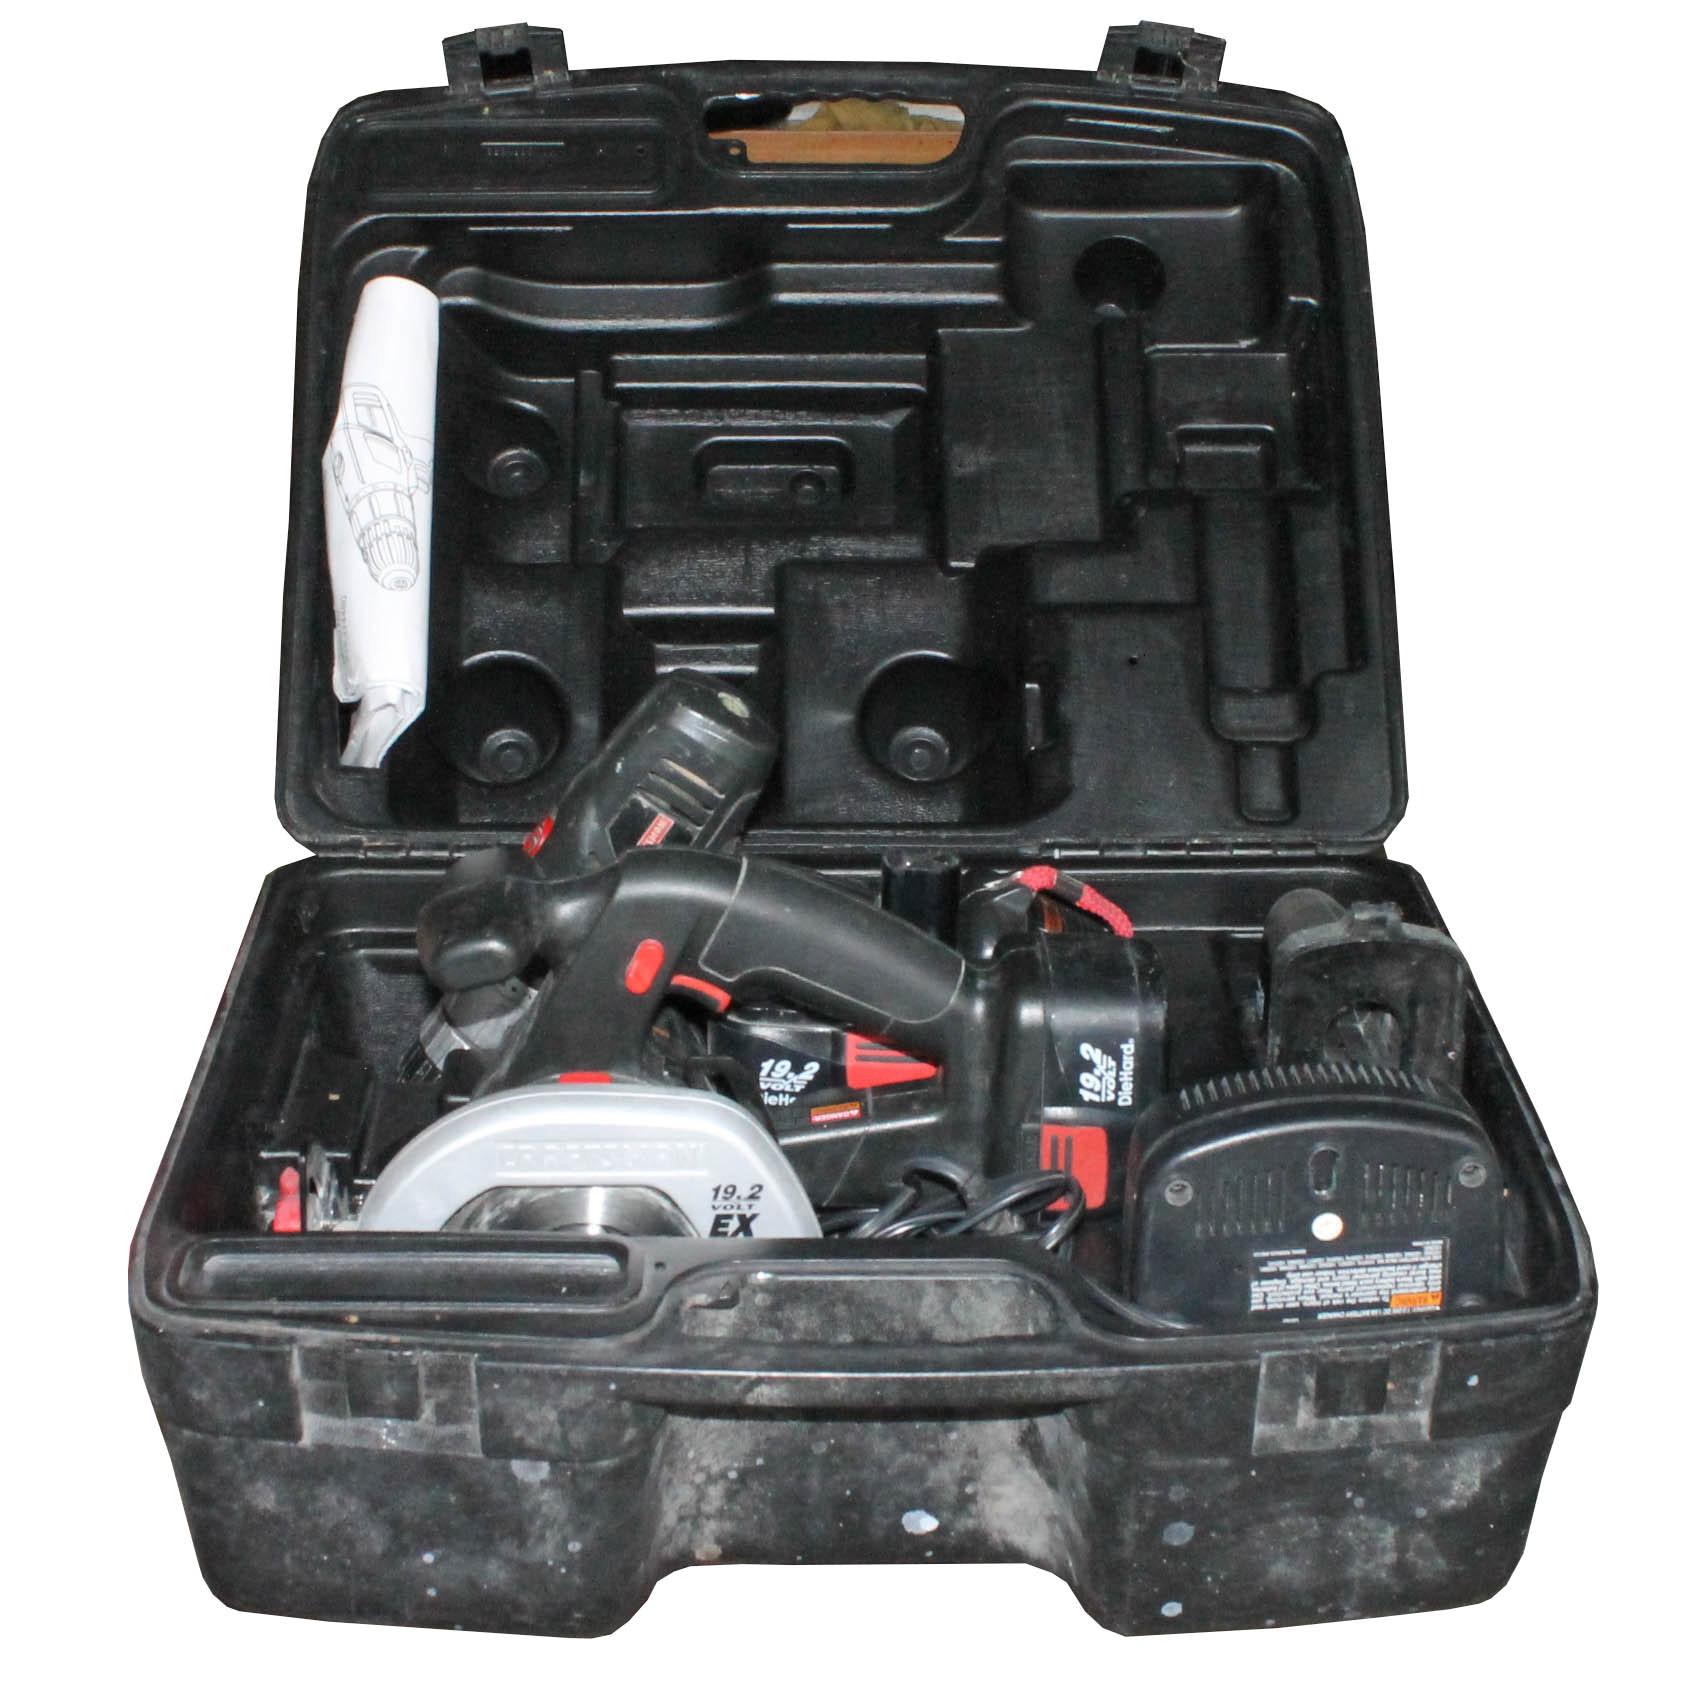 Craftsman 19.2 Volt Cordless Power Tool Set